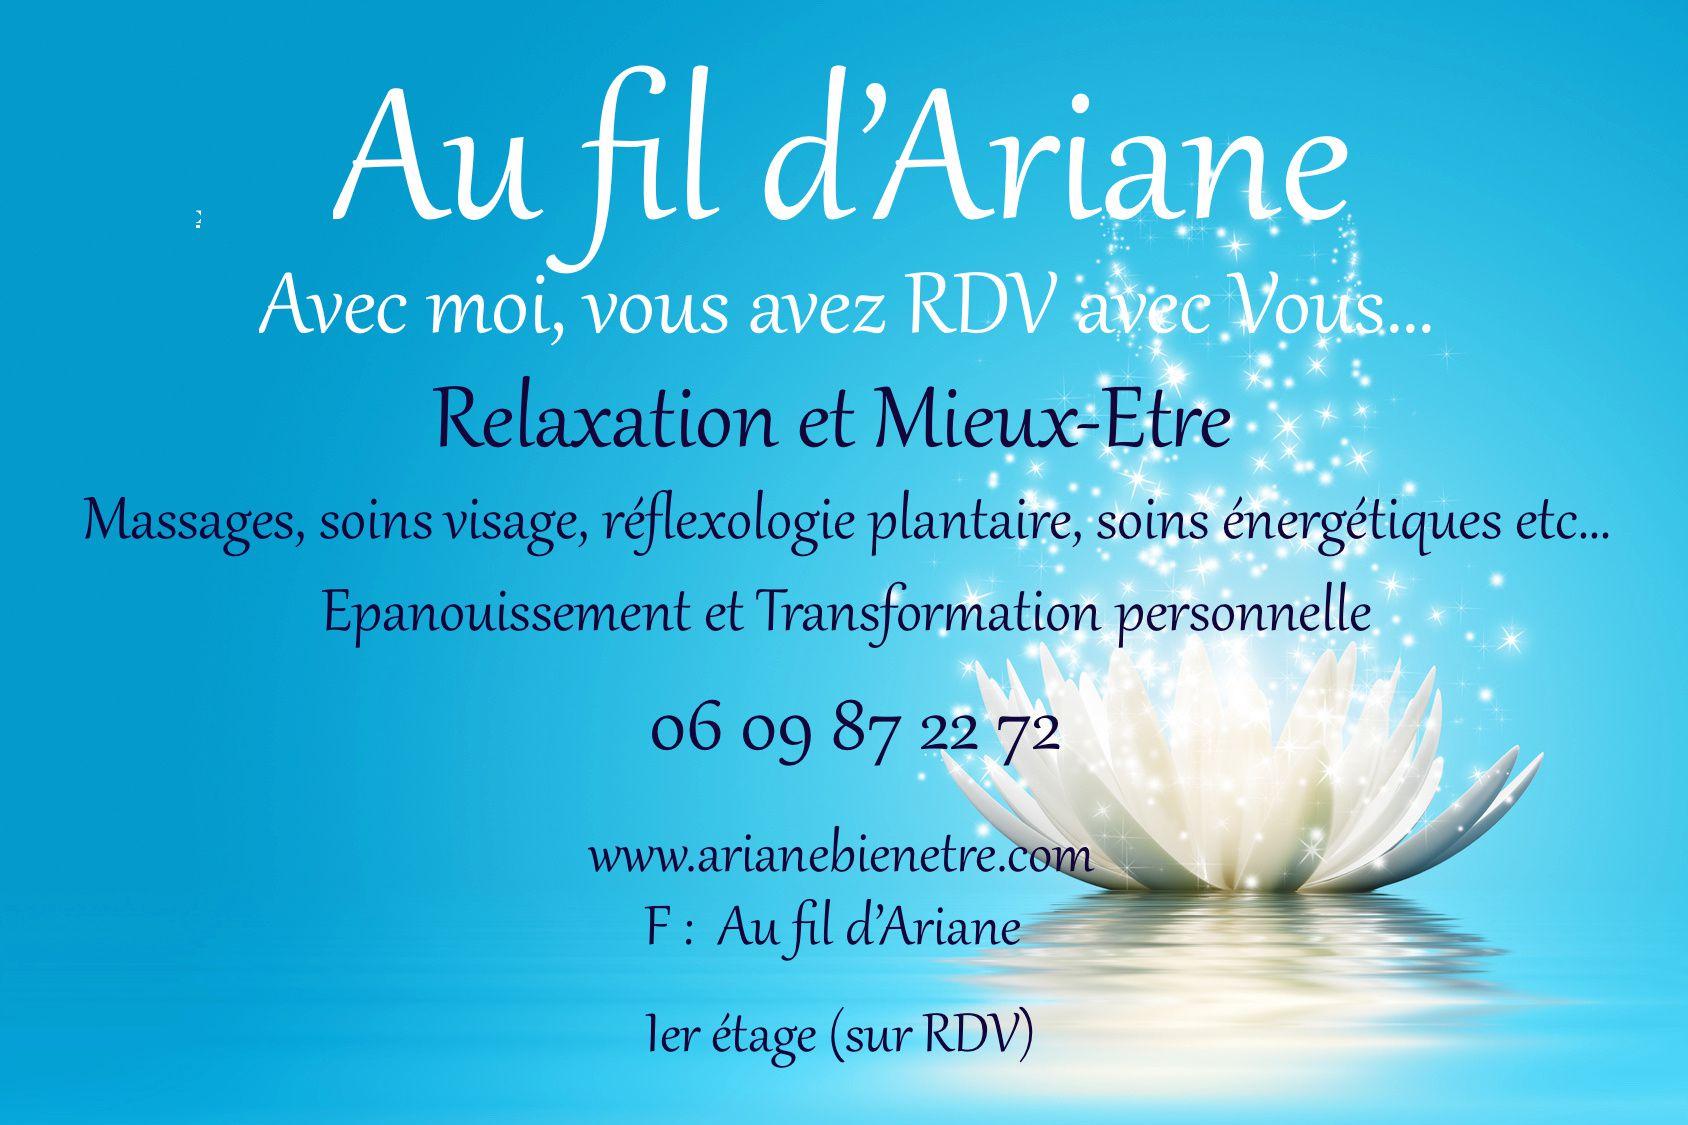 Au Fil d'Ariane institut de beauté